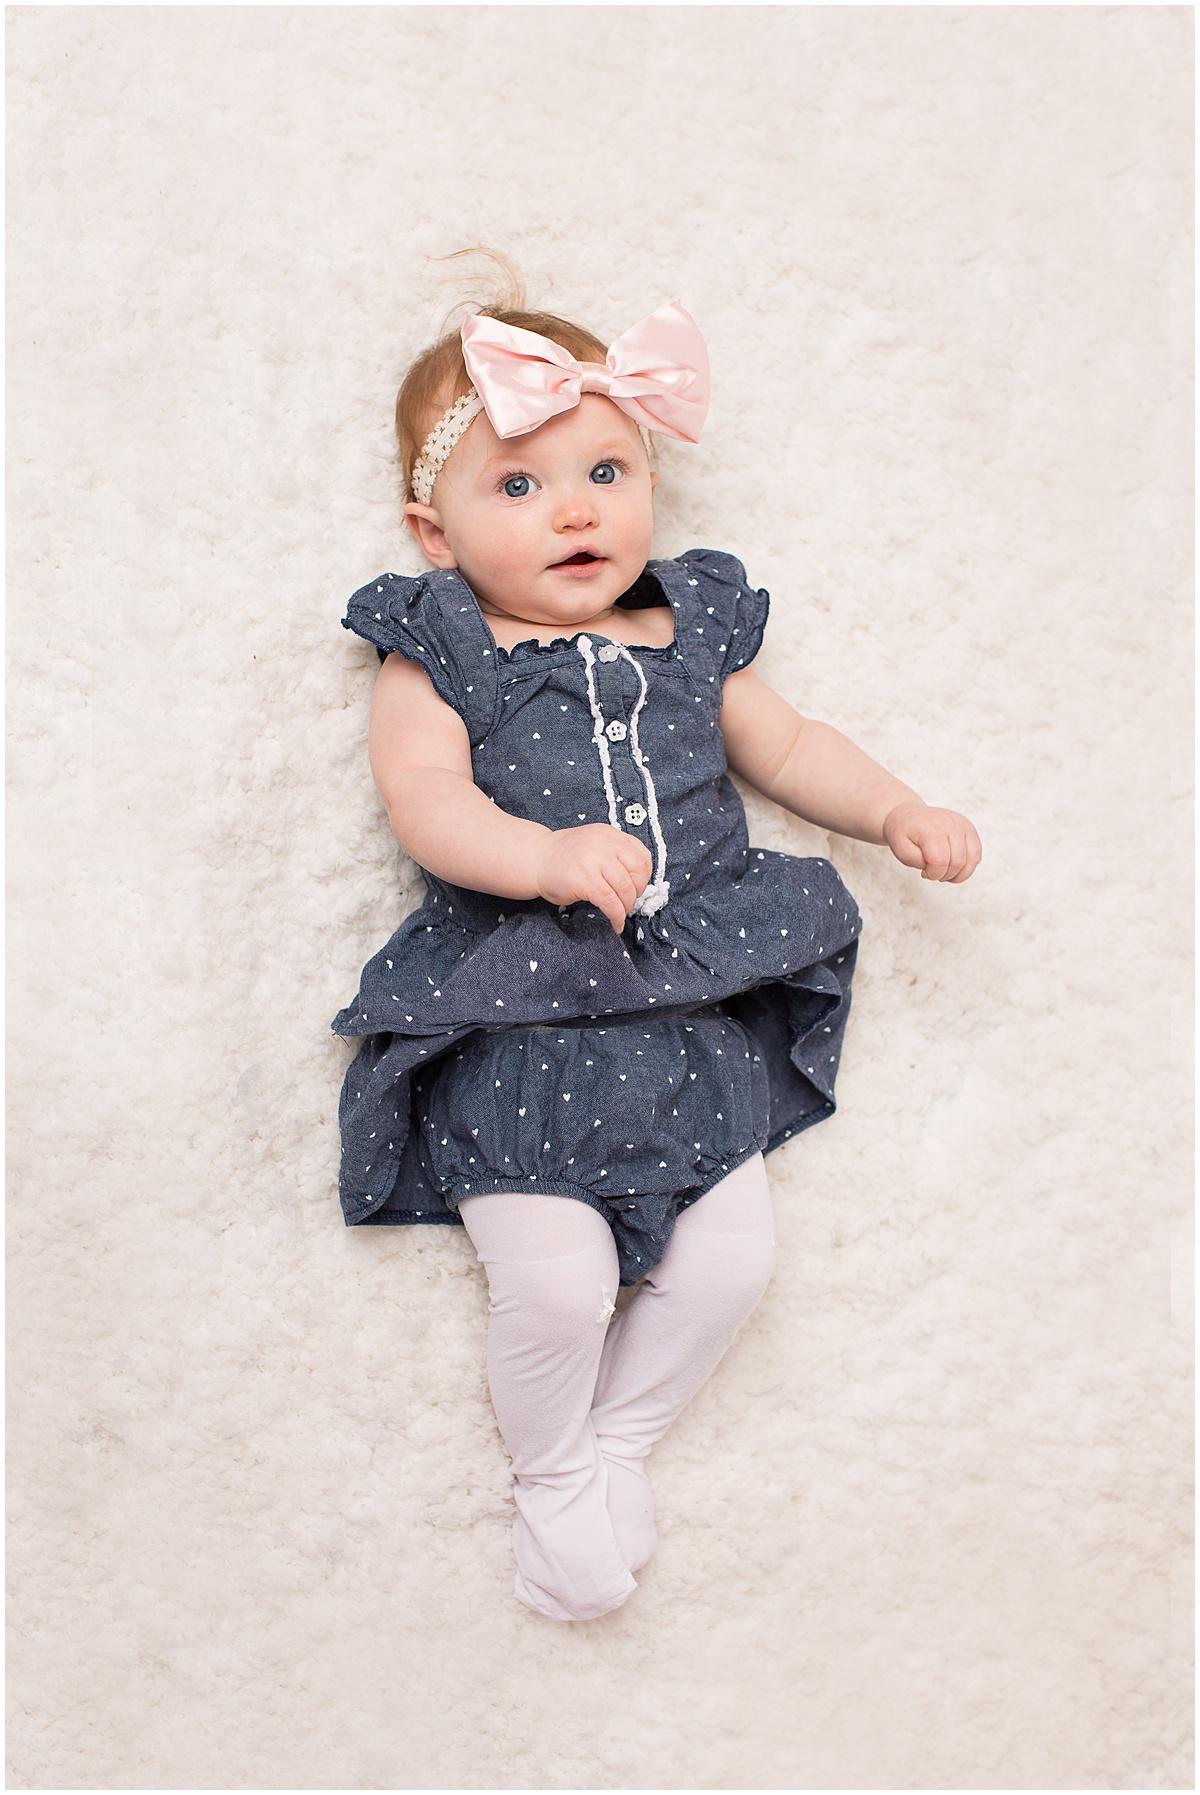 Child and Baby Studio Photography_Boise Idaho_ Meridian Idaho_Eagle Idaho_Leah Southwick Photography_0007.jpg